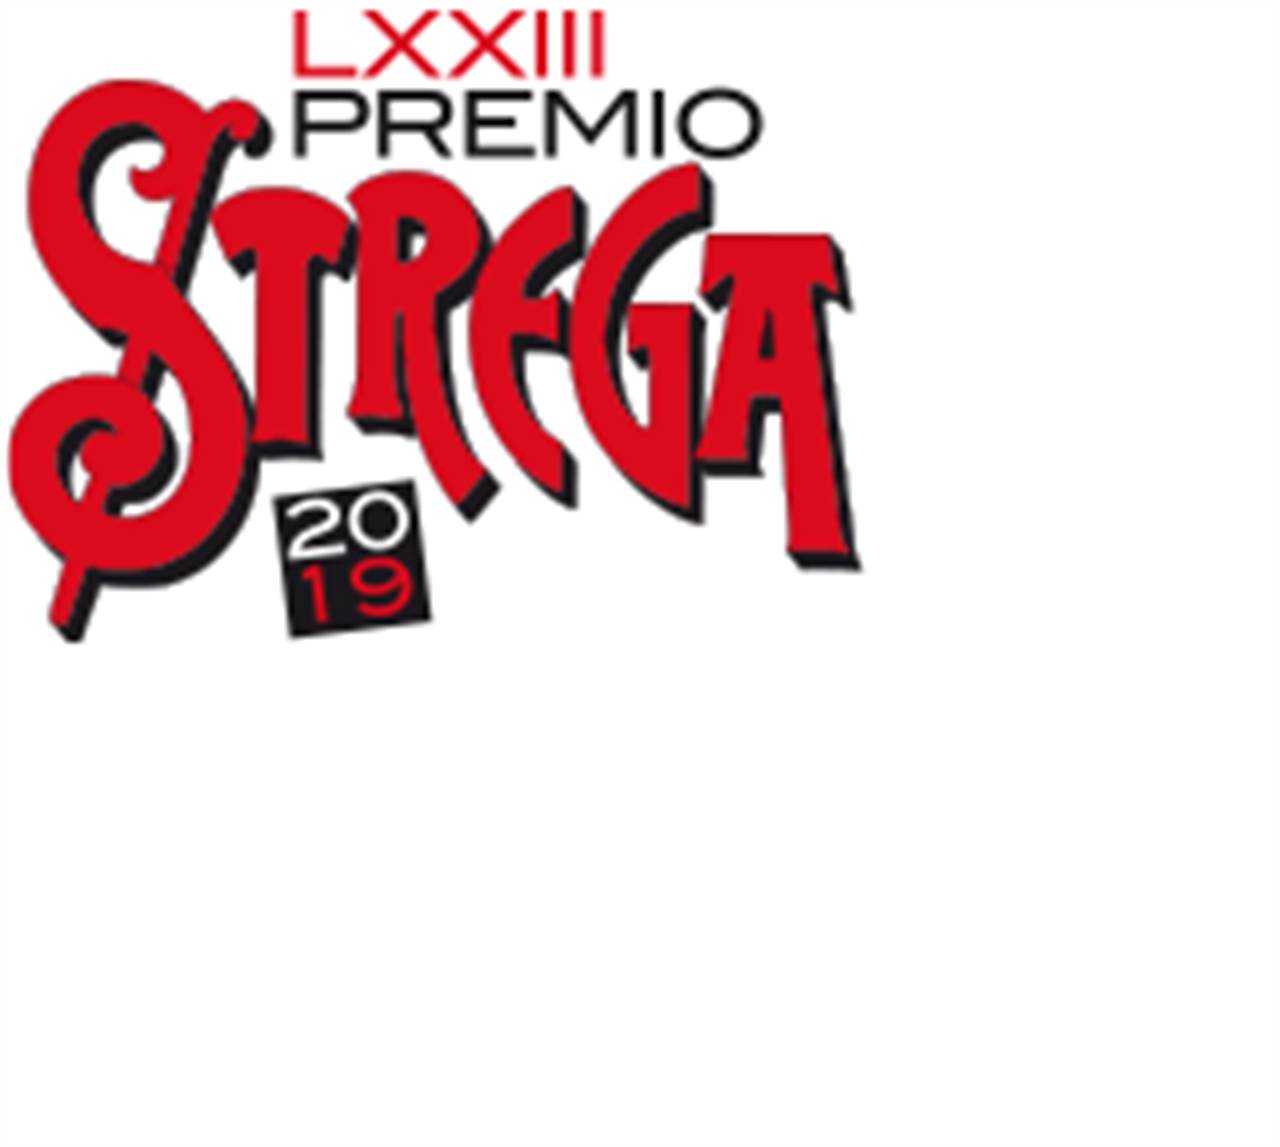 premiostrega2019-1579711109.png